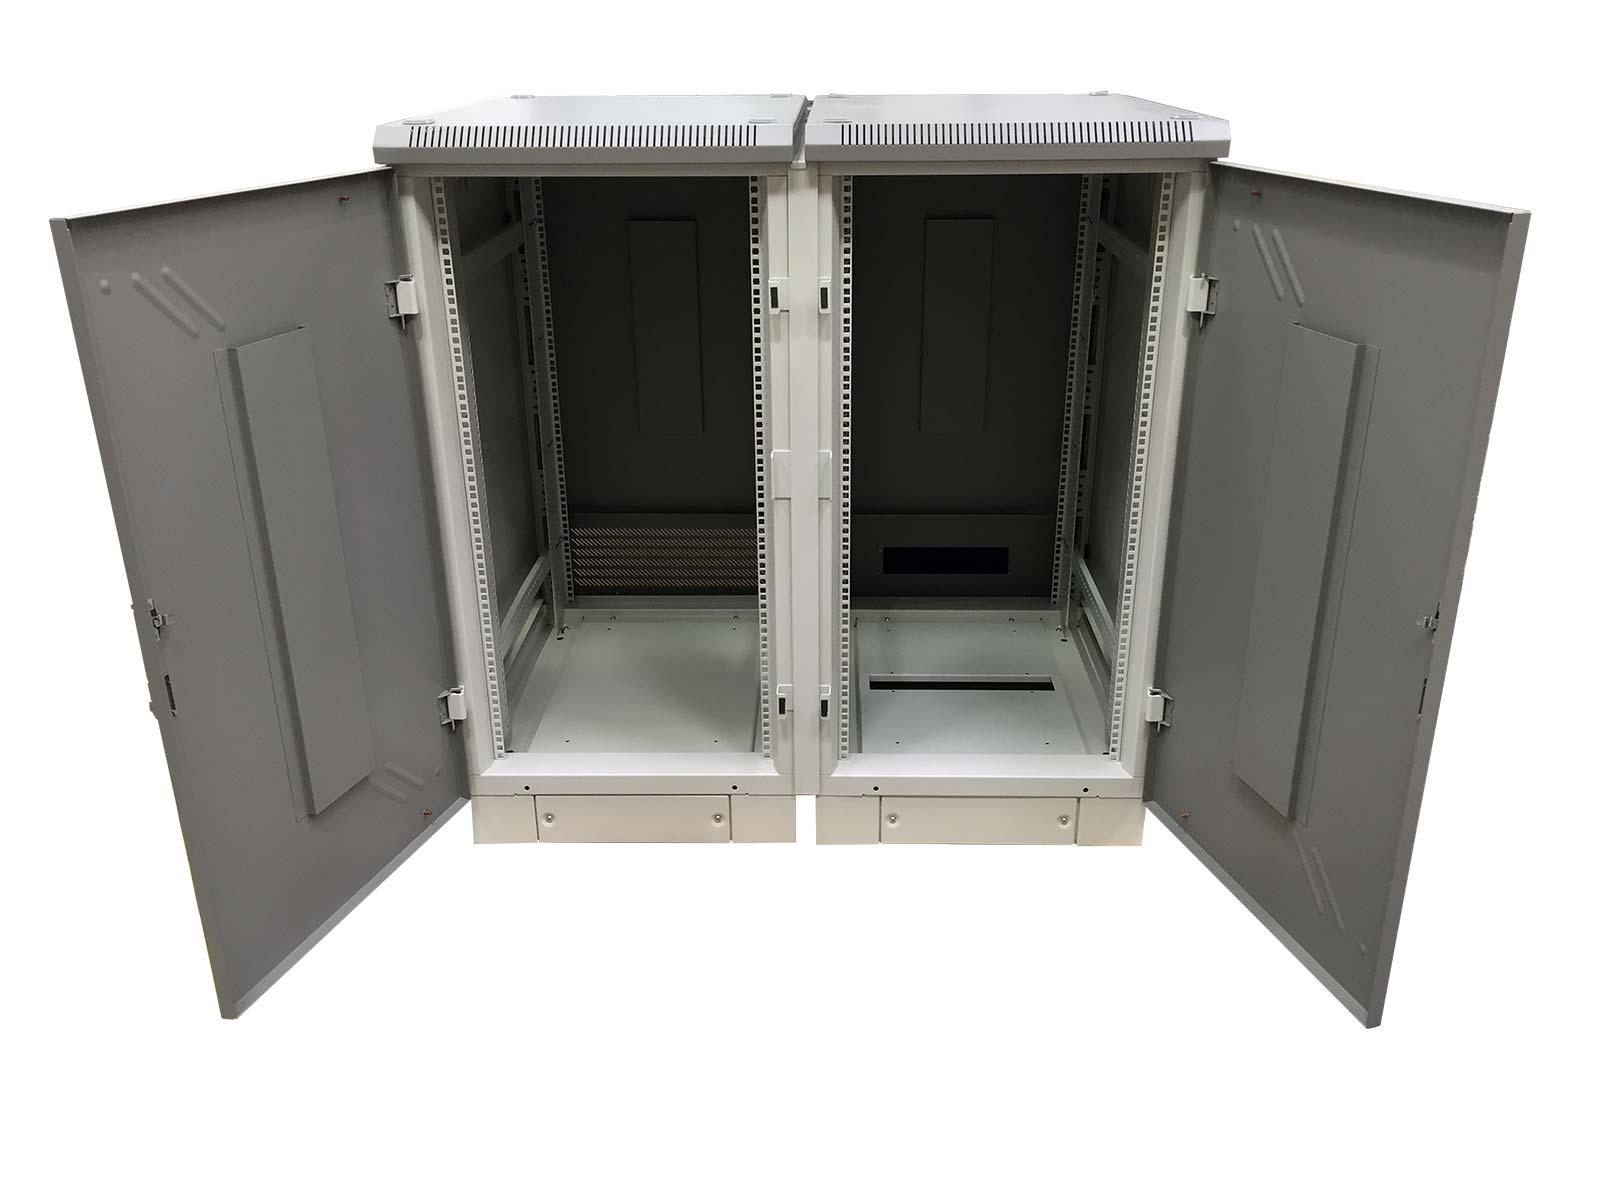 IMRAK 19 Inch Cabinet